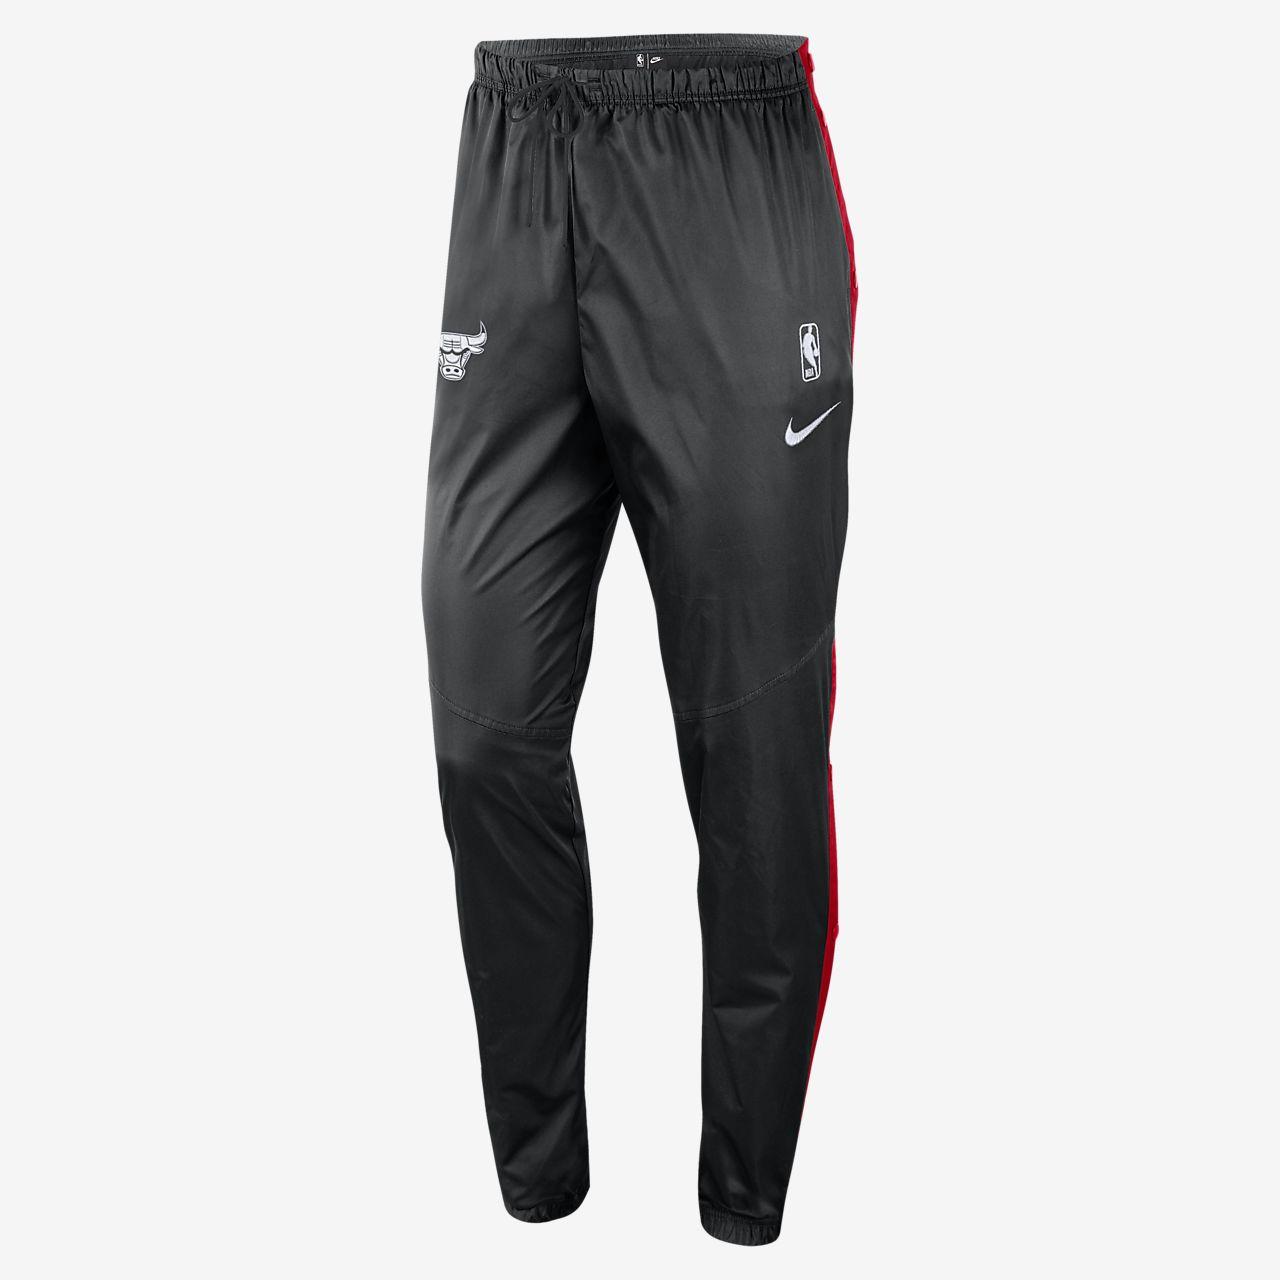 Pantalones de la NBA para mujer Chicago Bulls Nike